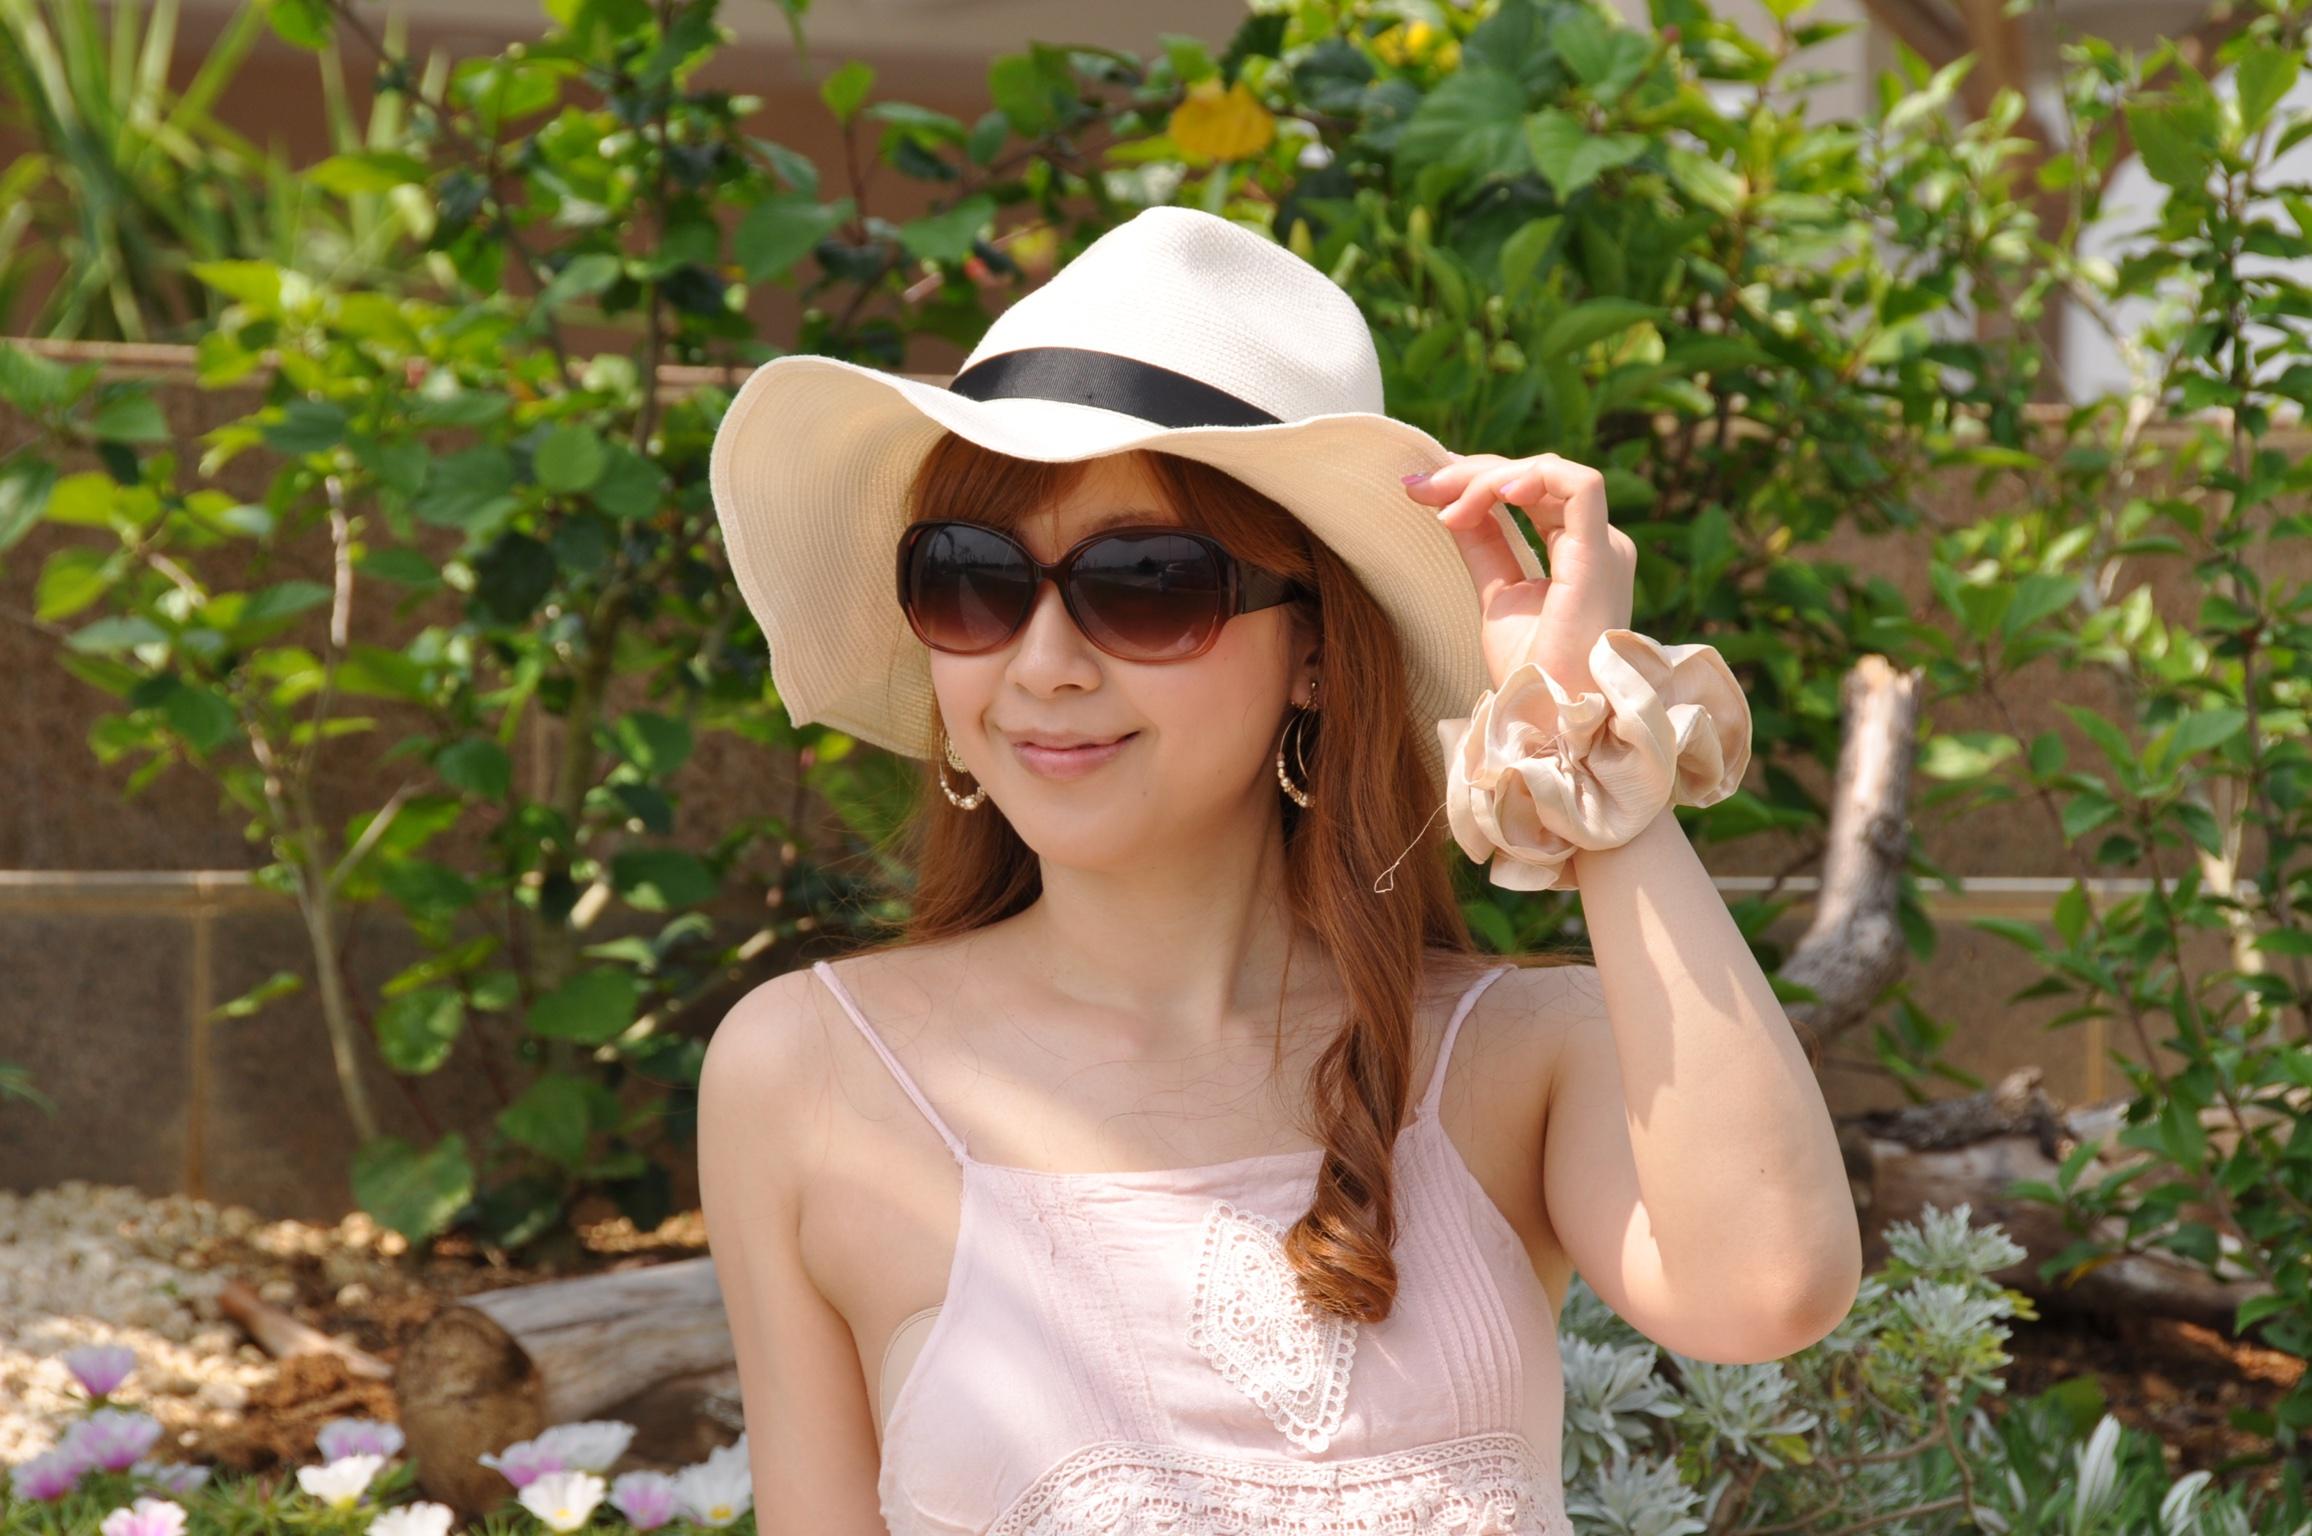 石垣島の真鍋智子